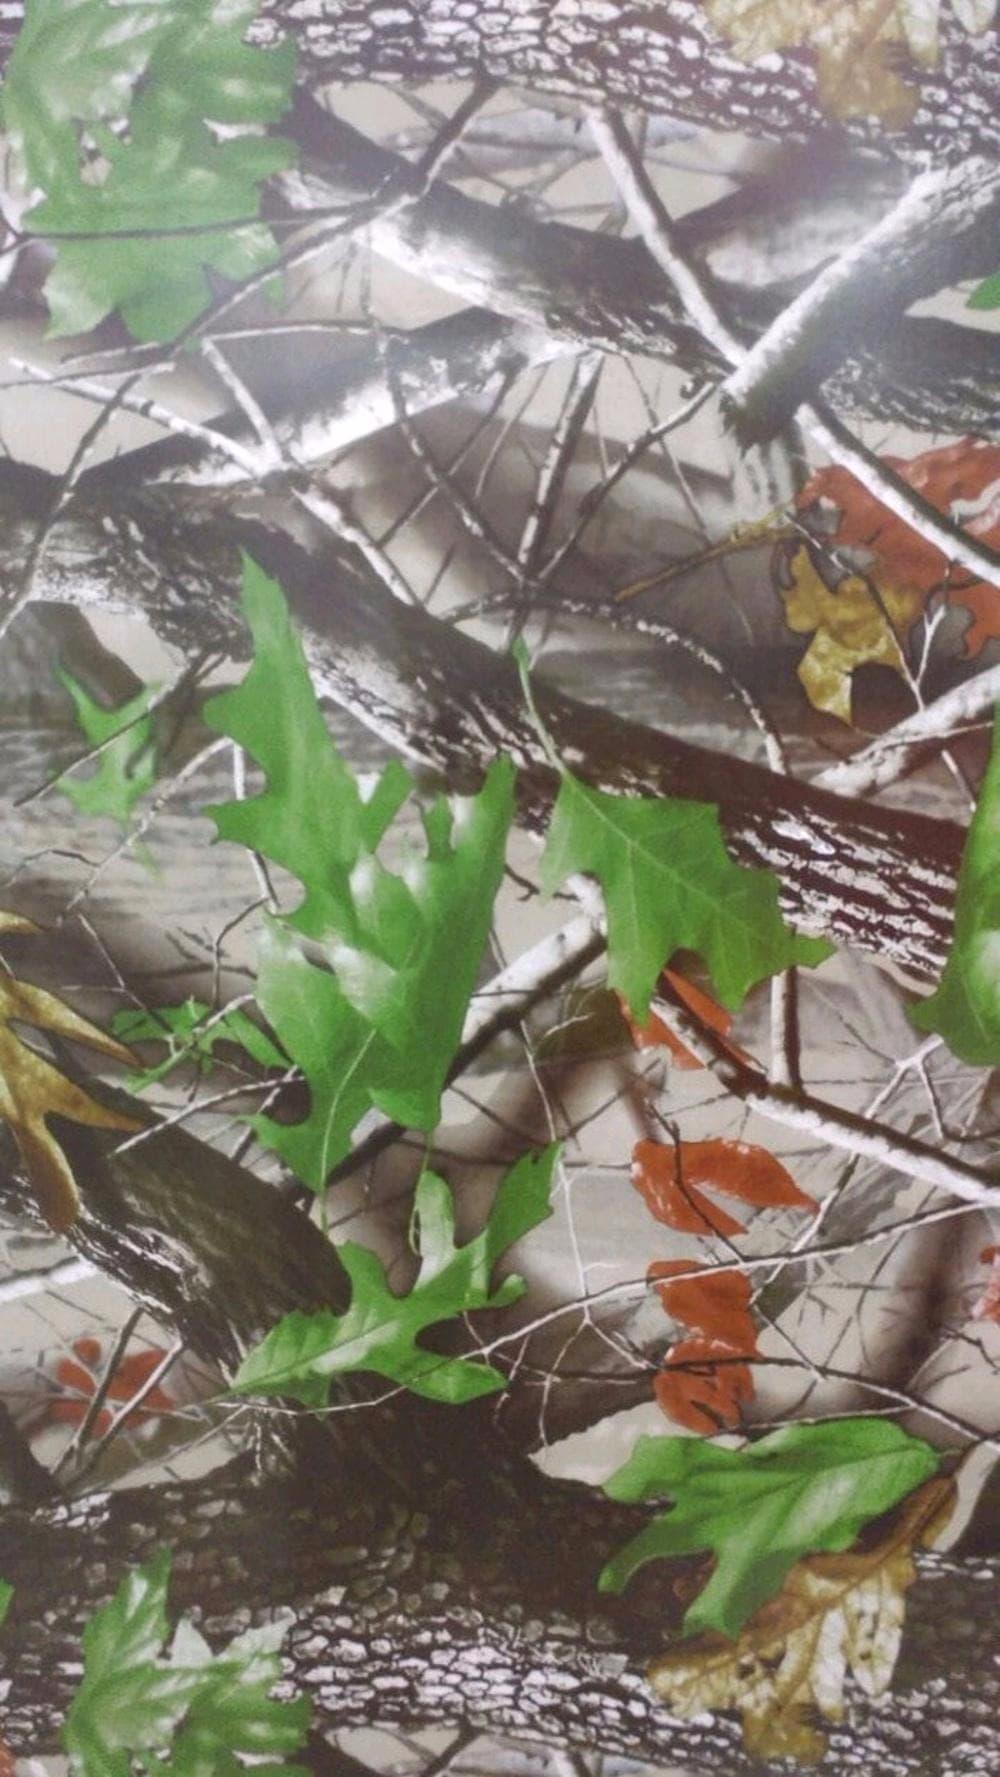 terbaru Sticker camo skotlet camo IMPORT mossy oak realtree max